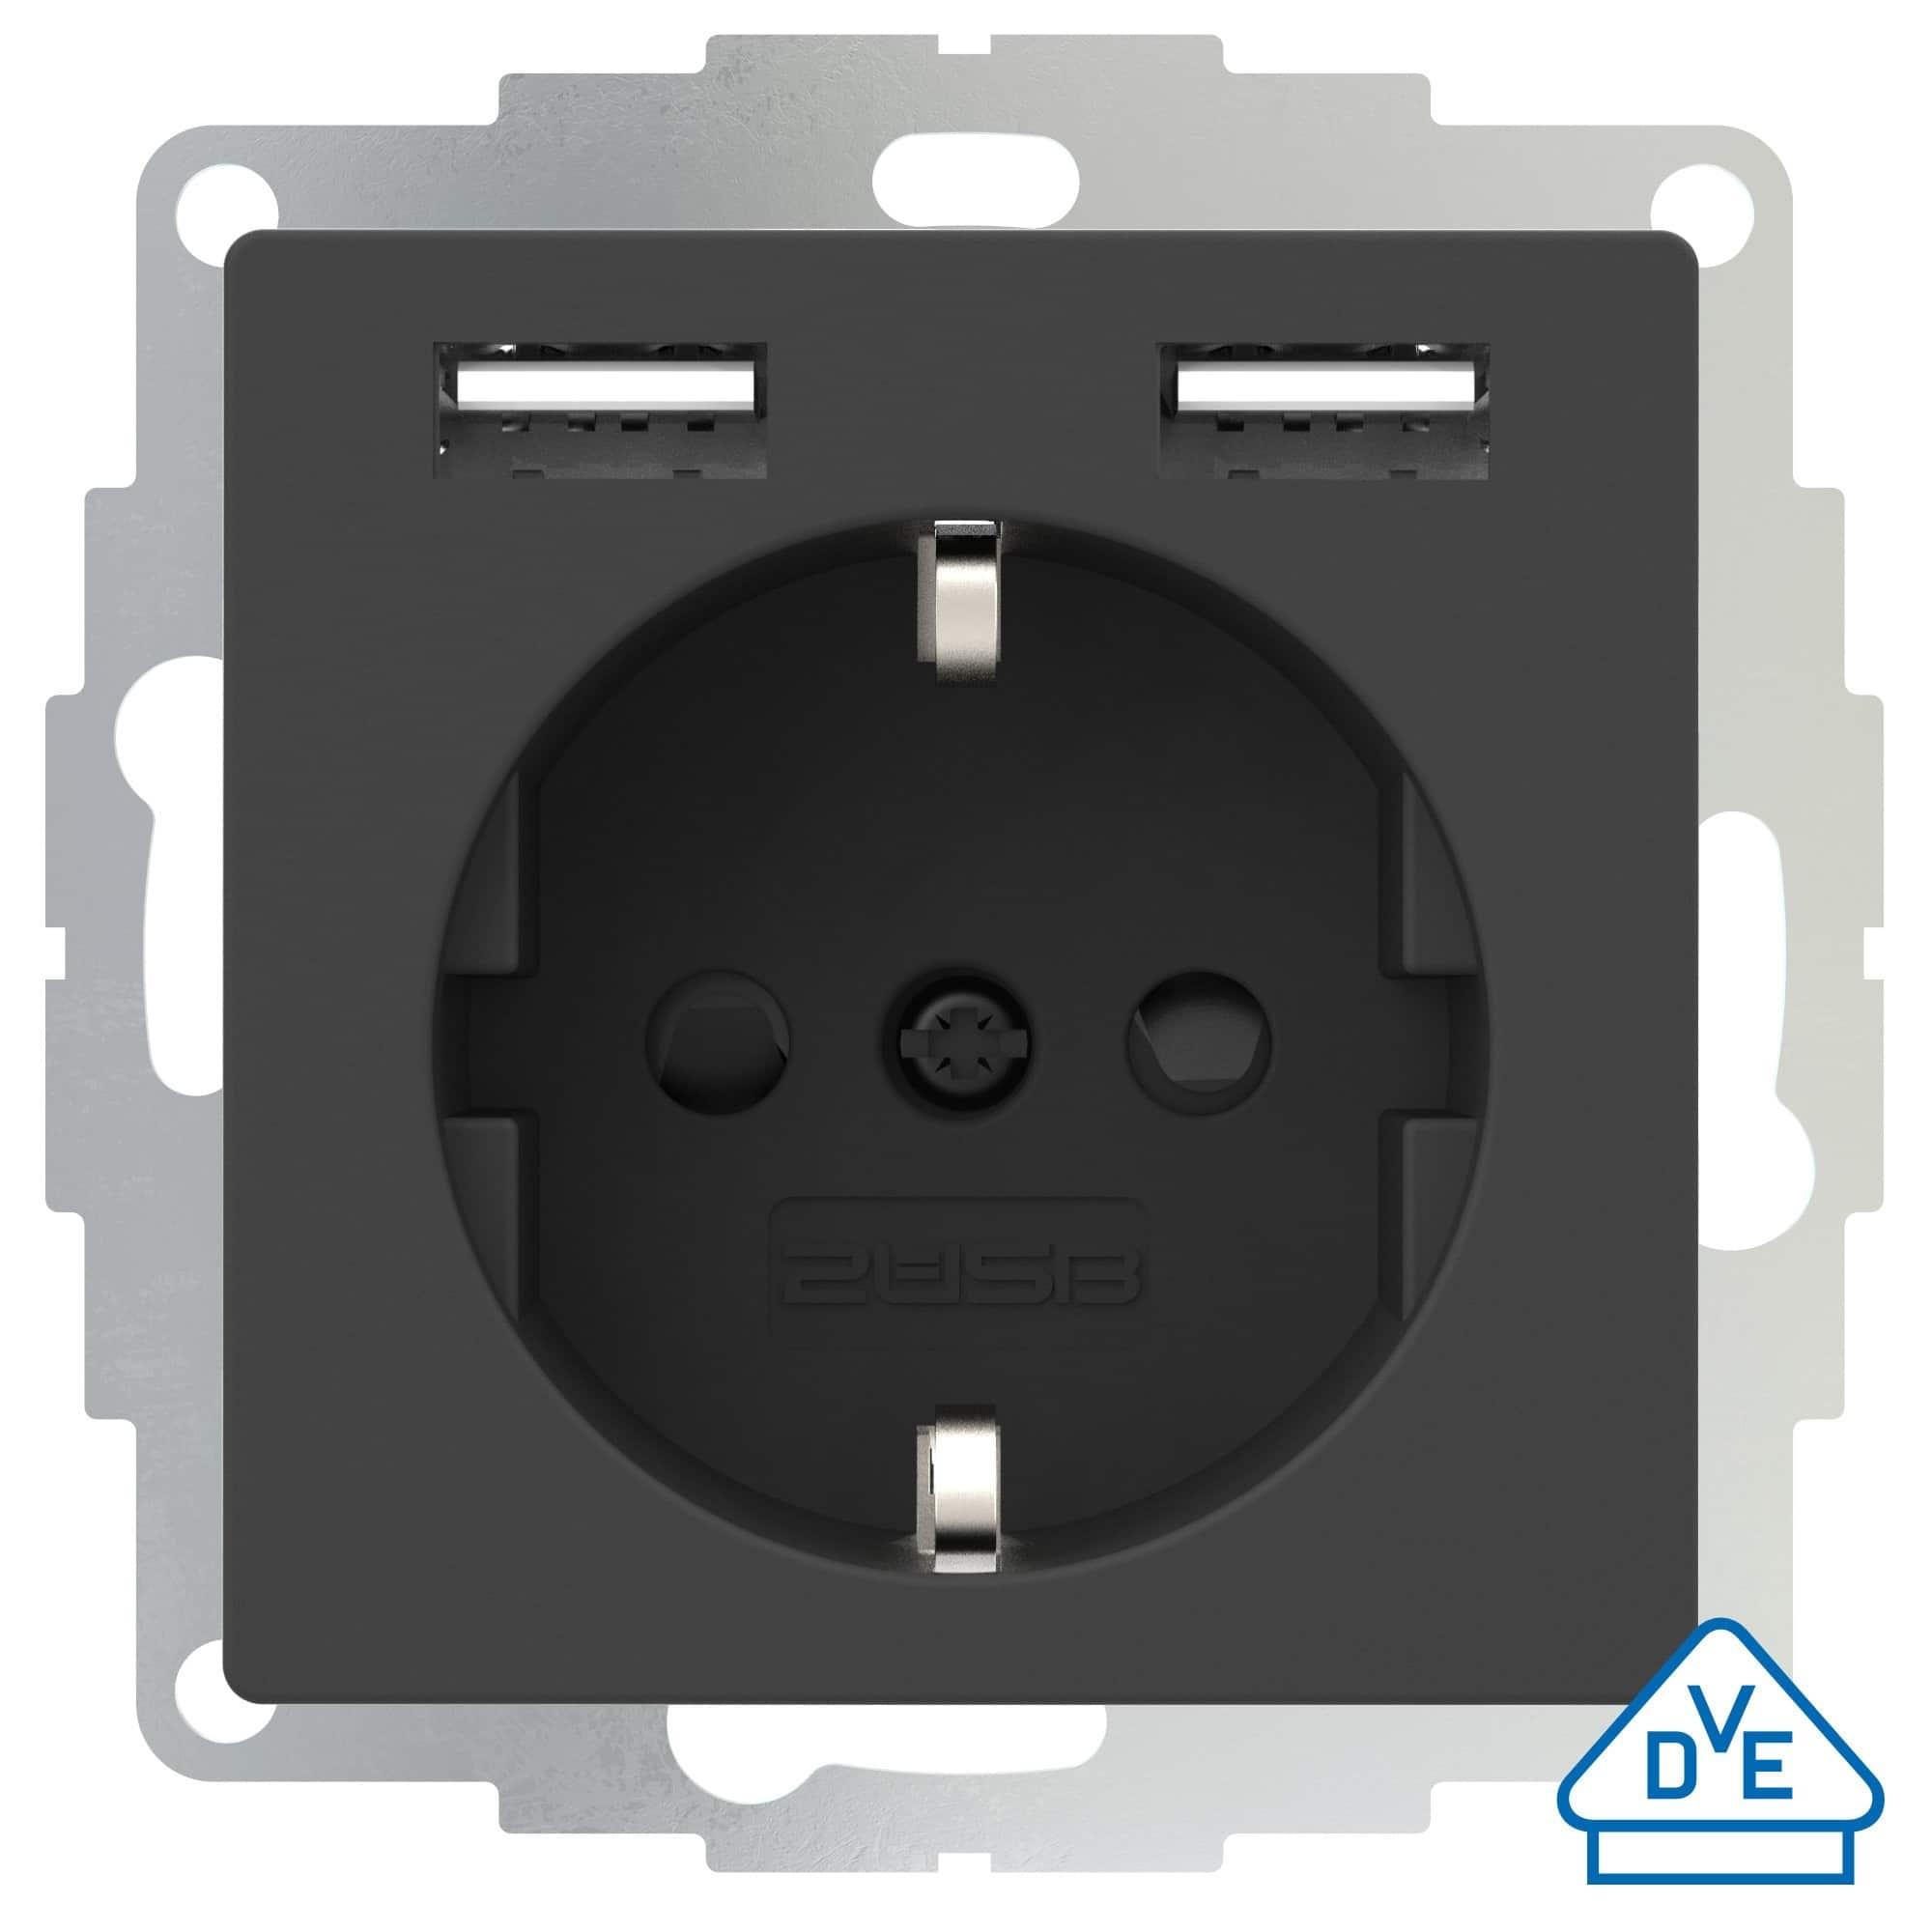 2USB Schutzkontakt-Steckdose 2x USB-A inCharge Pro55 anthrazit matt 55x55mm #106206